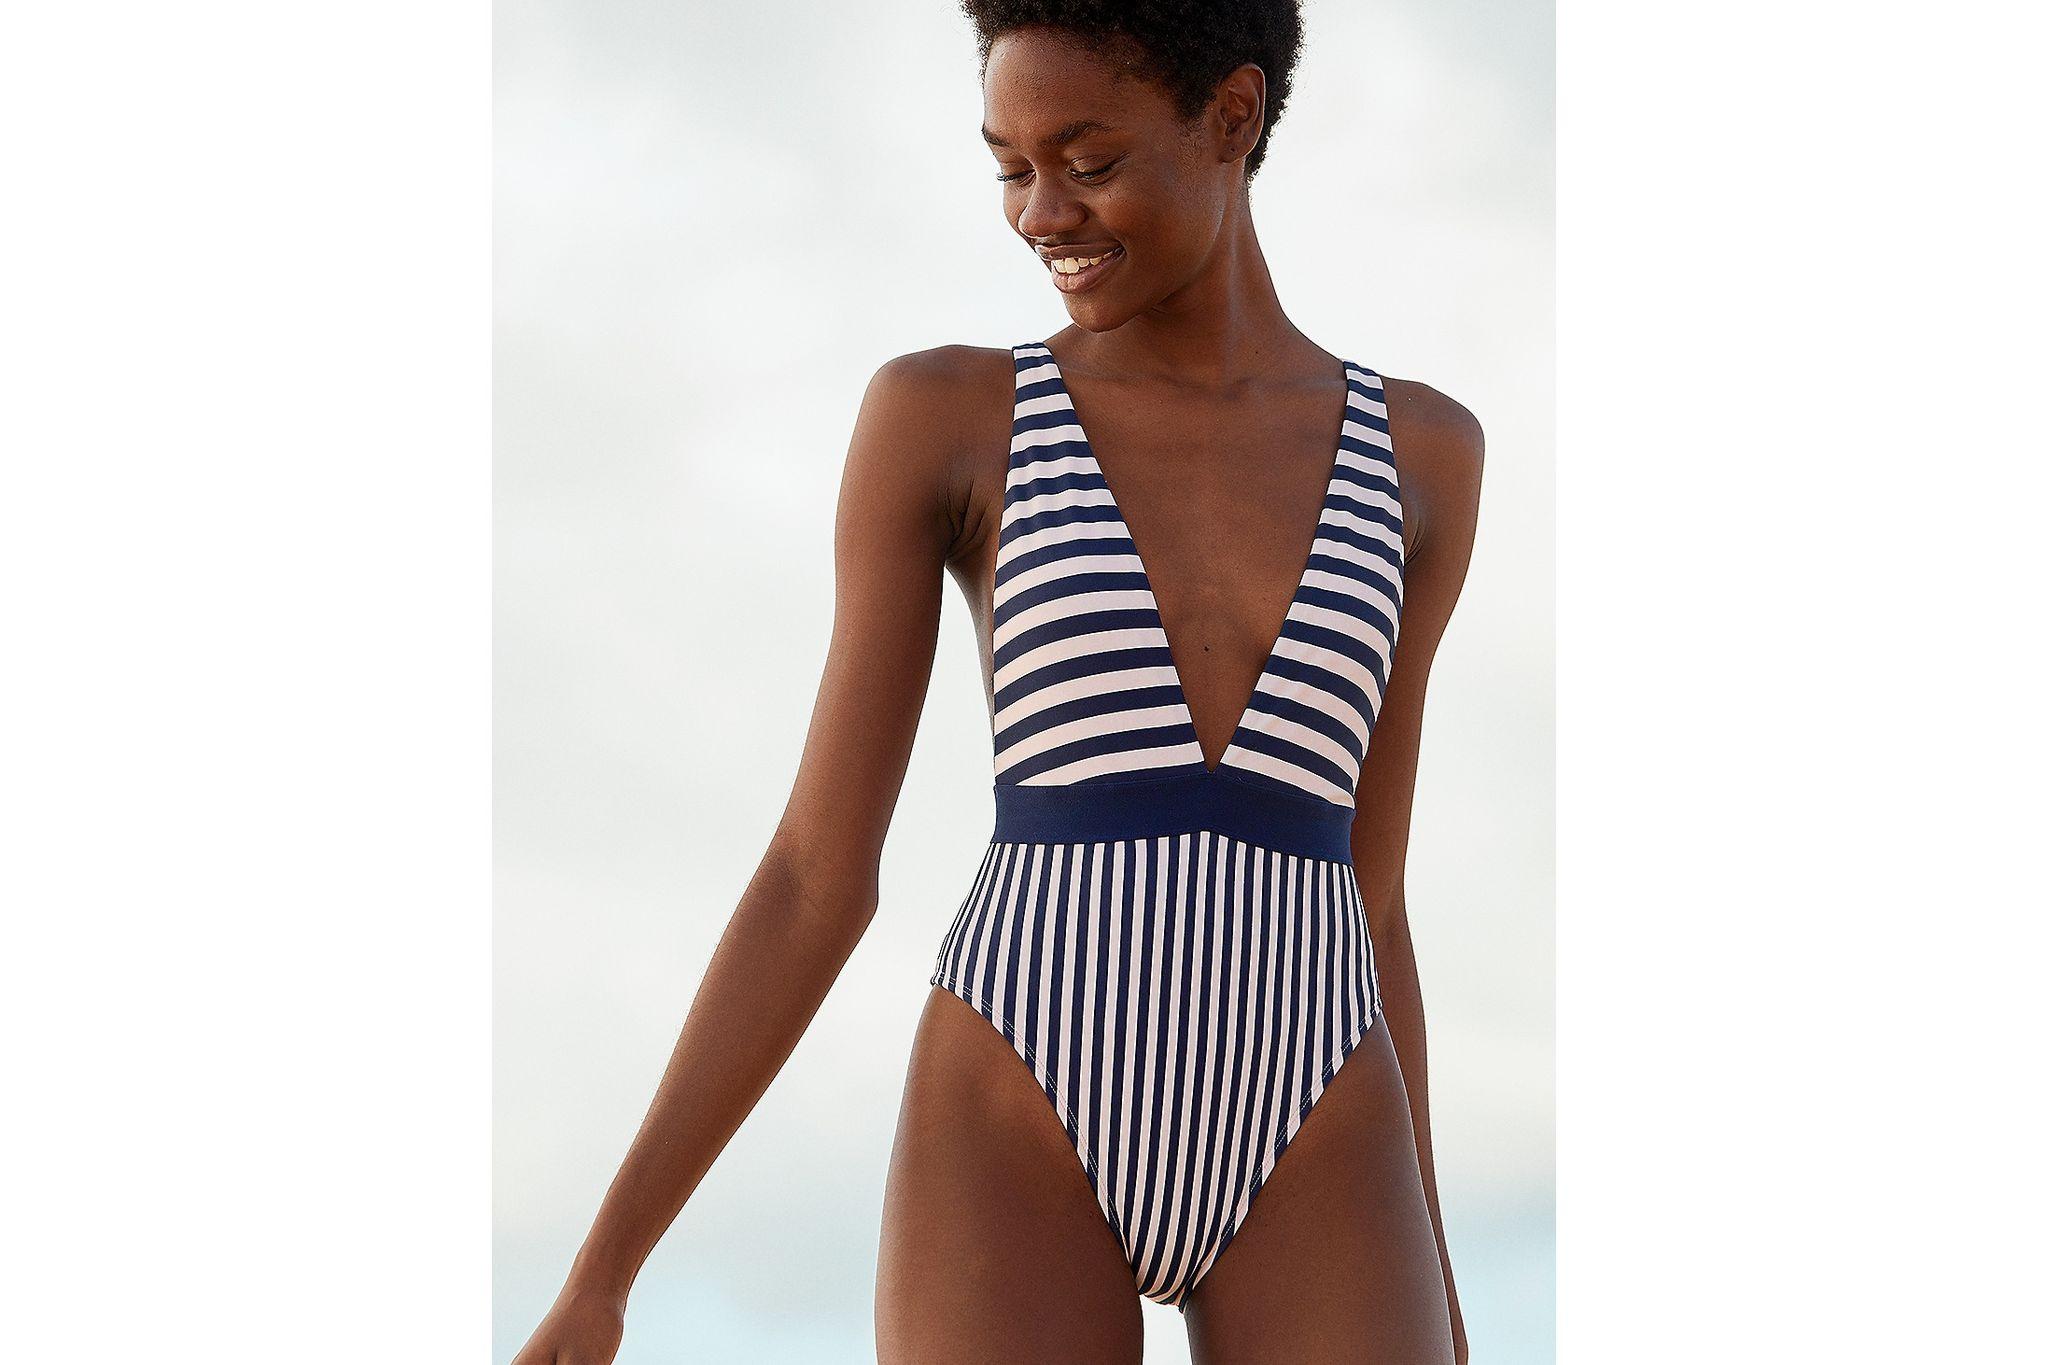 da4774f695 American Eagle Aerie Plunge One Piece Swimsuit Price in Egypt ...